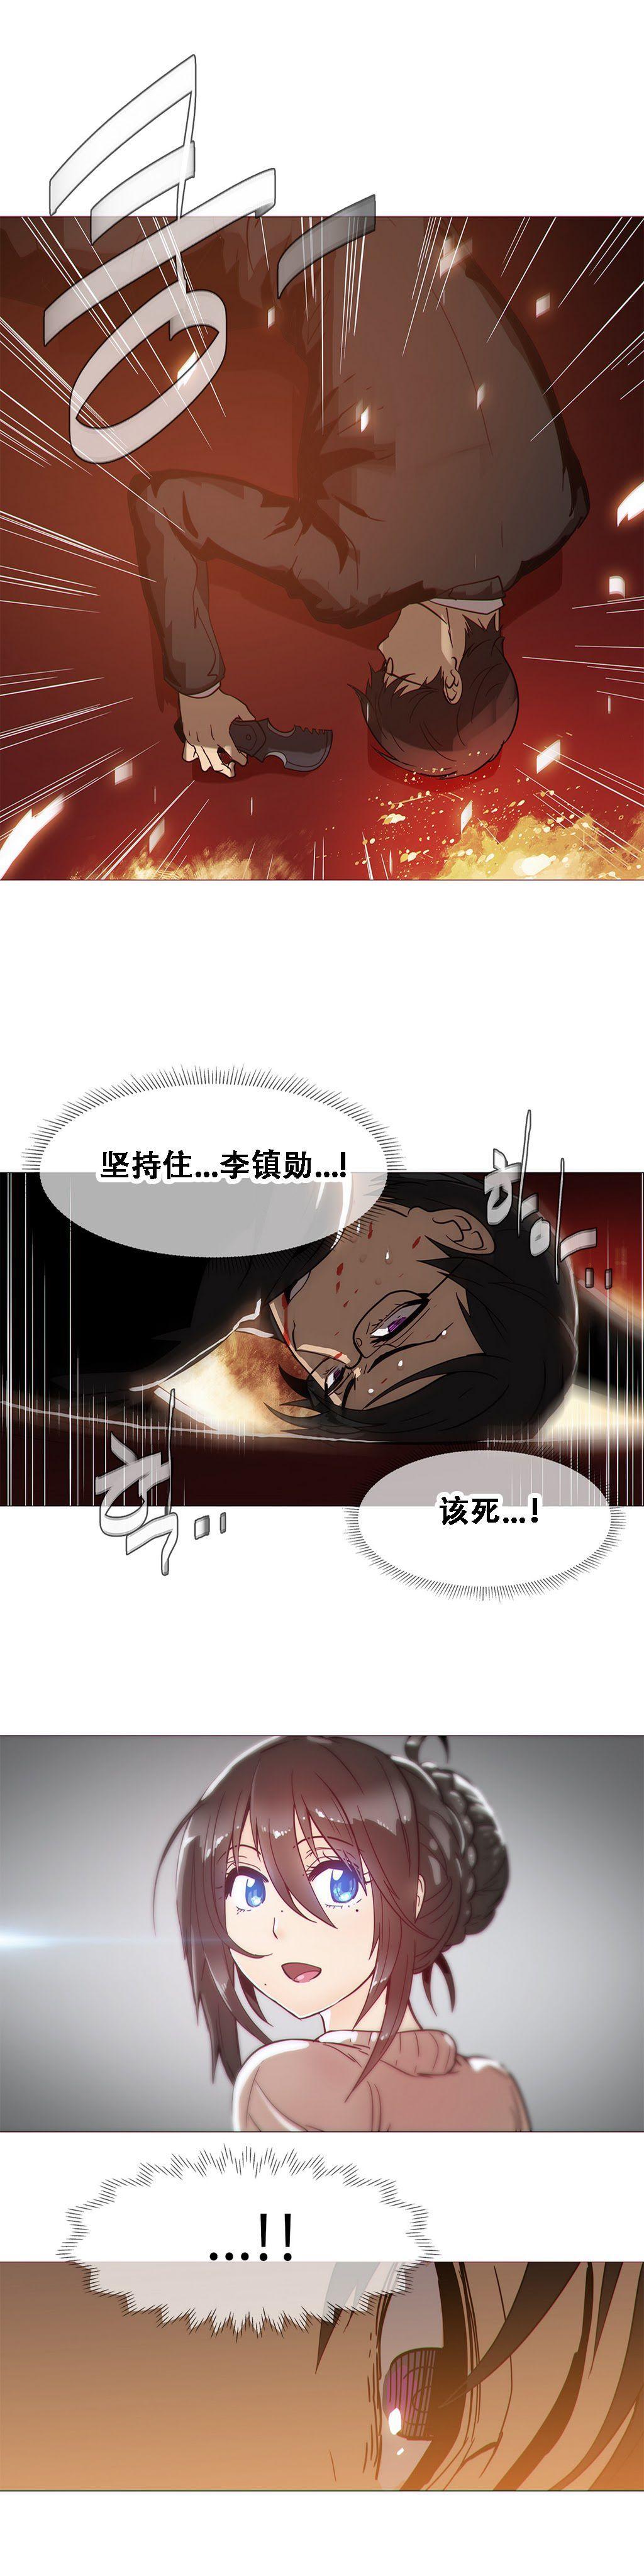 HouseHold Affairs 【卞赤鲤个人汉化】1~33话(持续更新中) 399